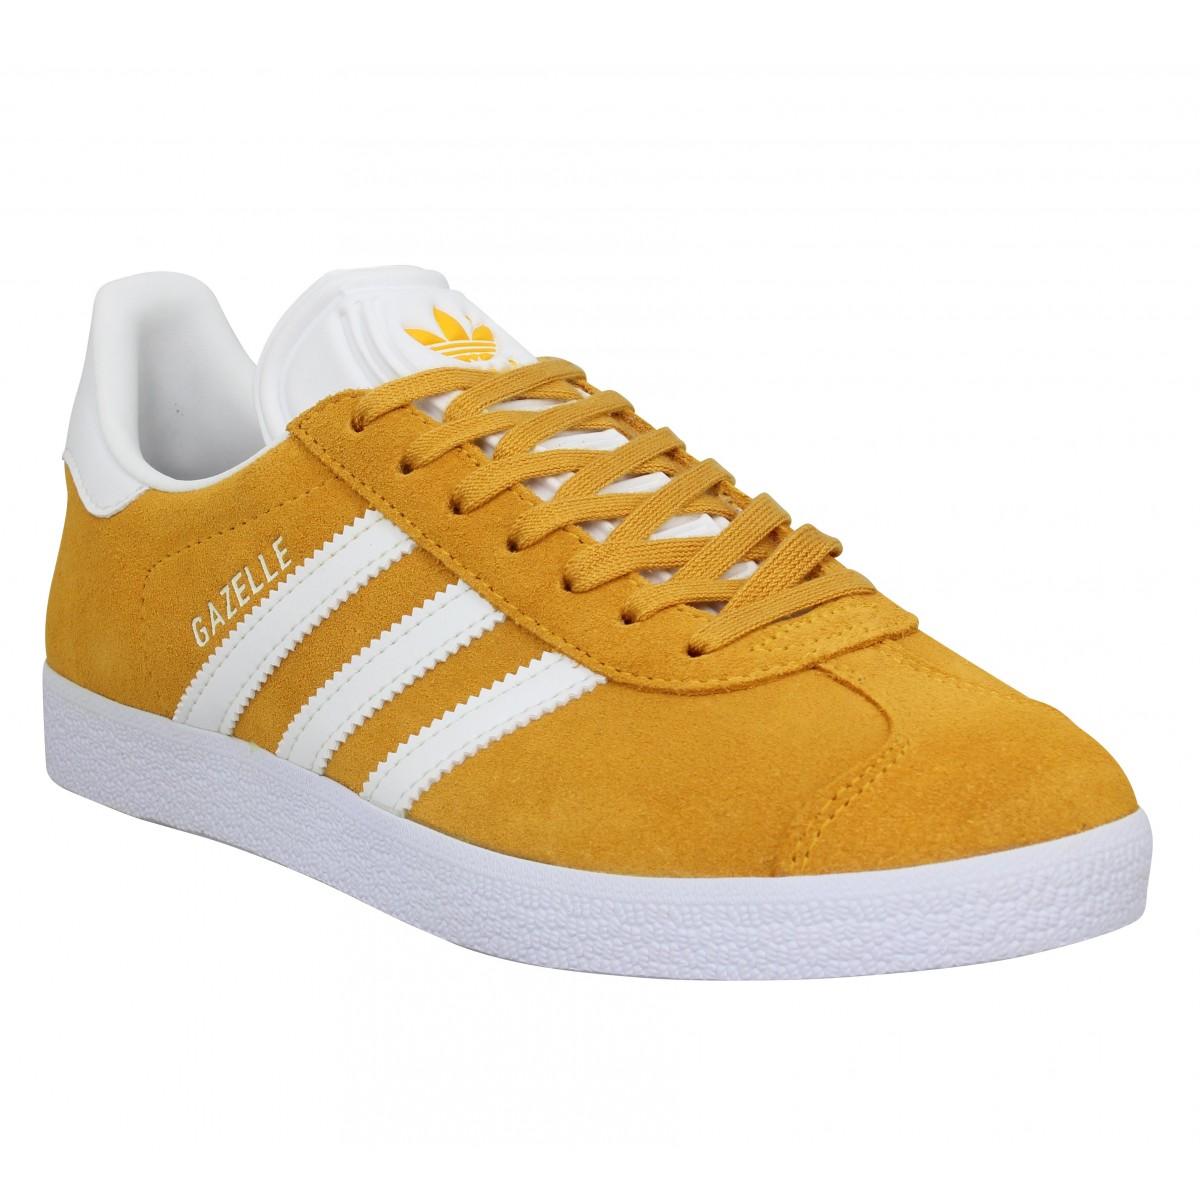 بانيان موصى به الأعلى gazelle adidas jaune - ovidsingh.com